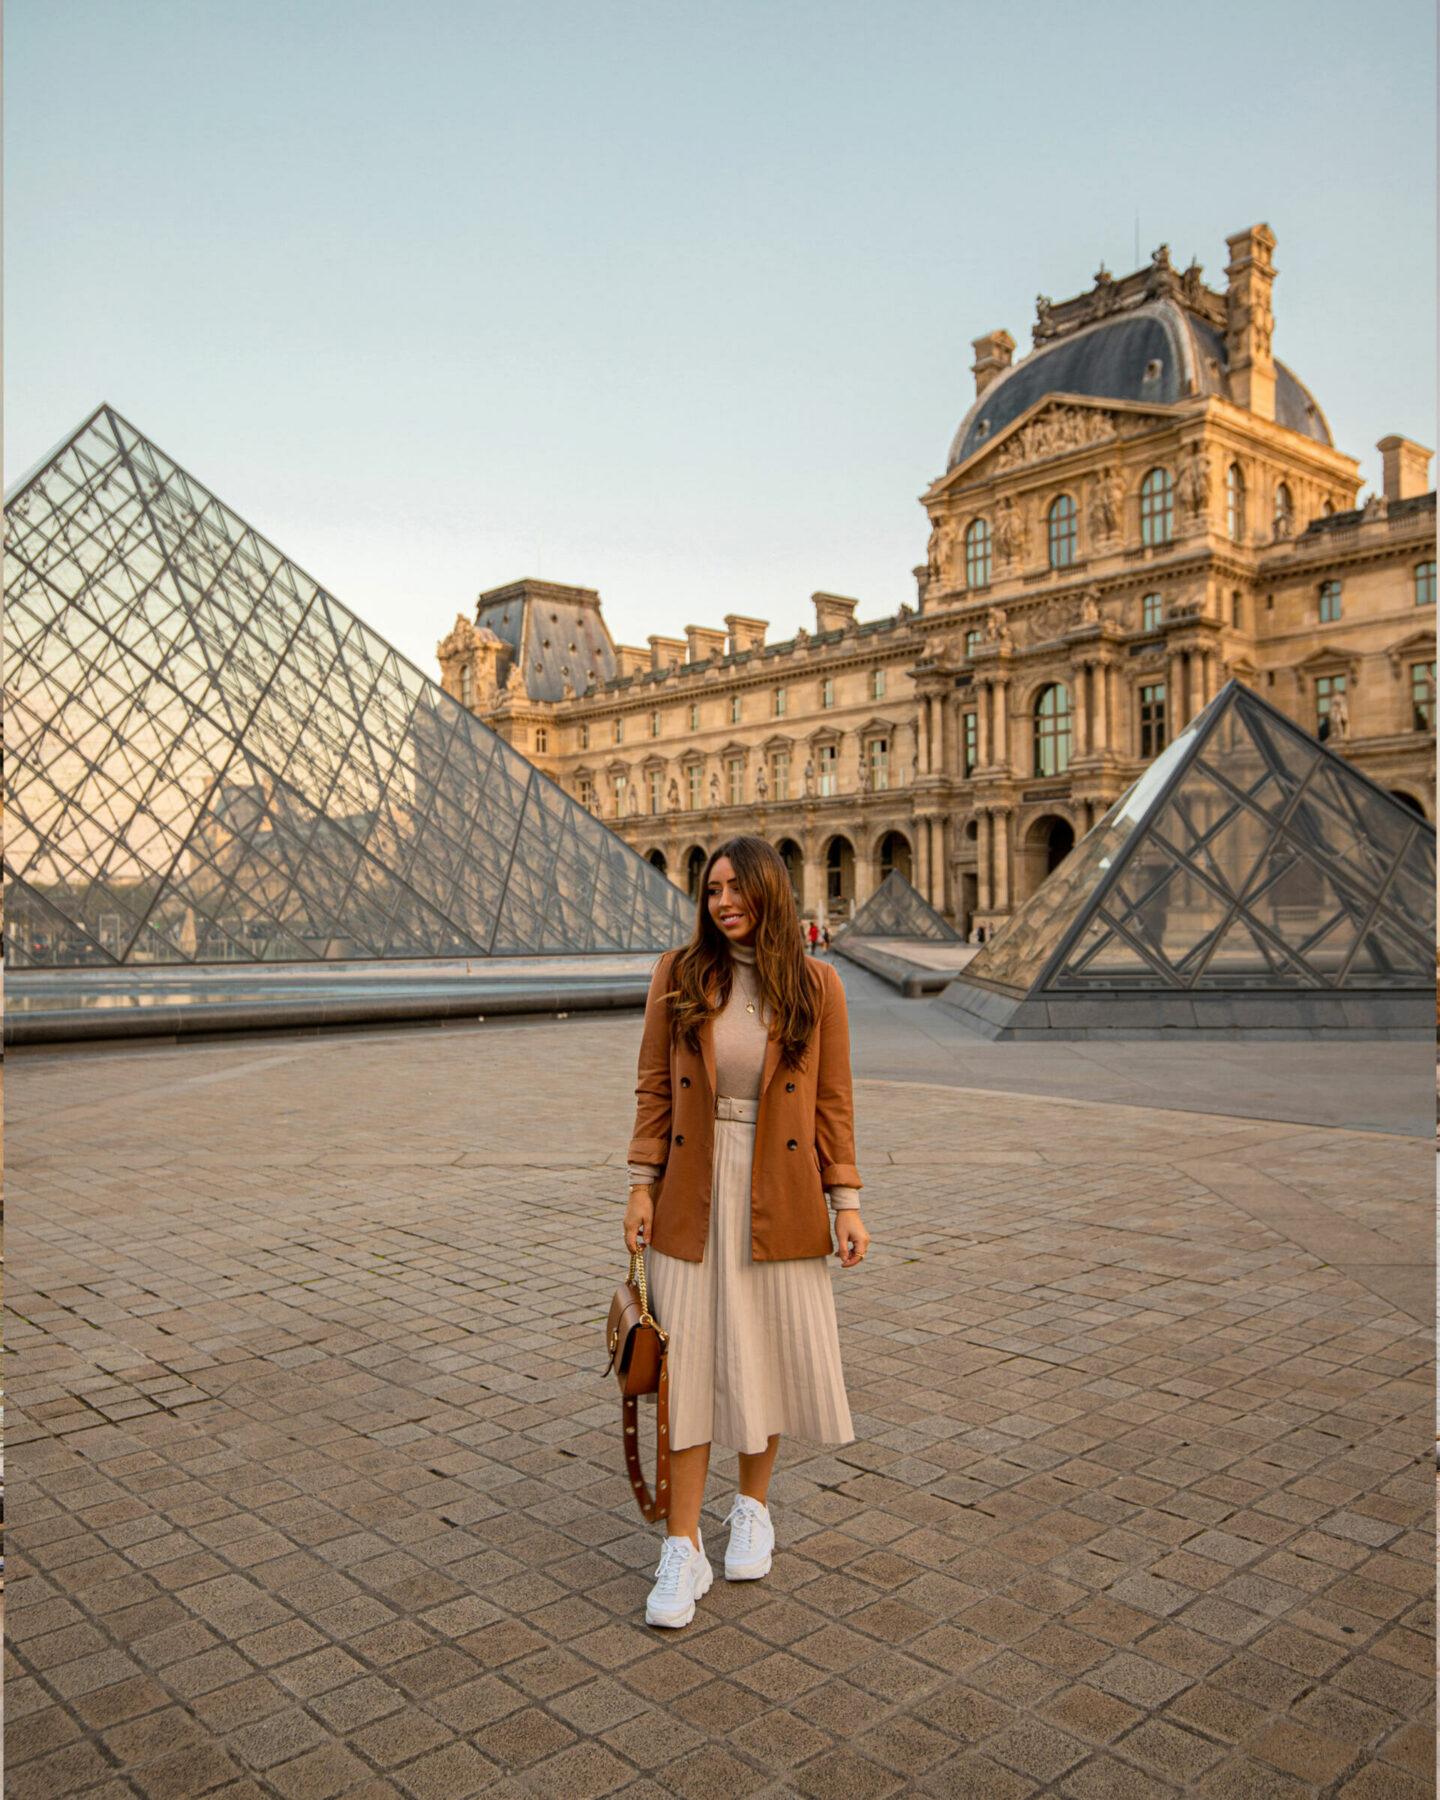 Paris Instagrammable Locations kelseyinlondon kelsey heinrichs things to do in Paris bucketlist louvre